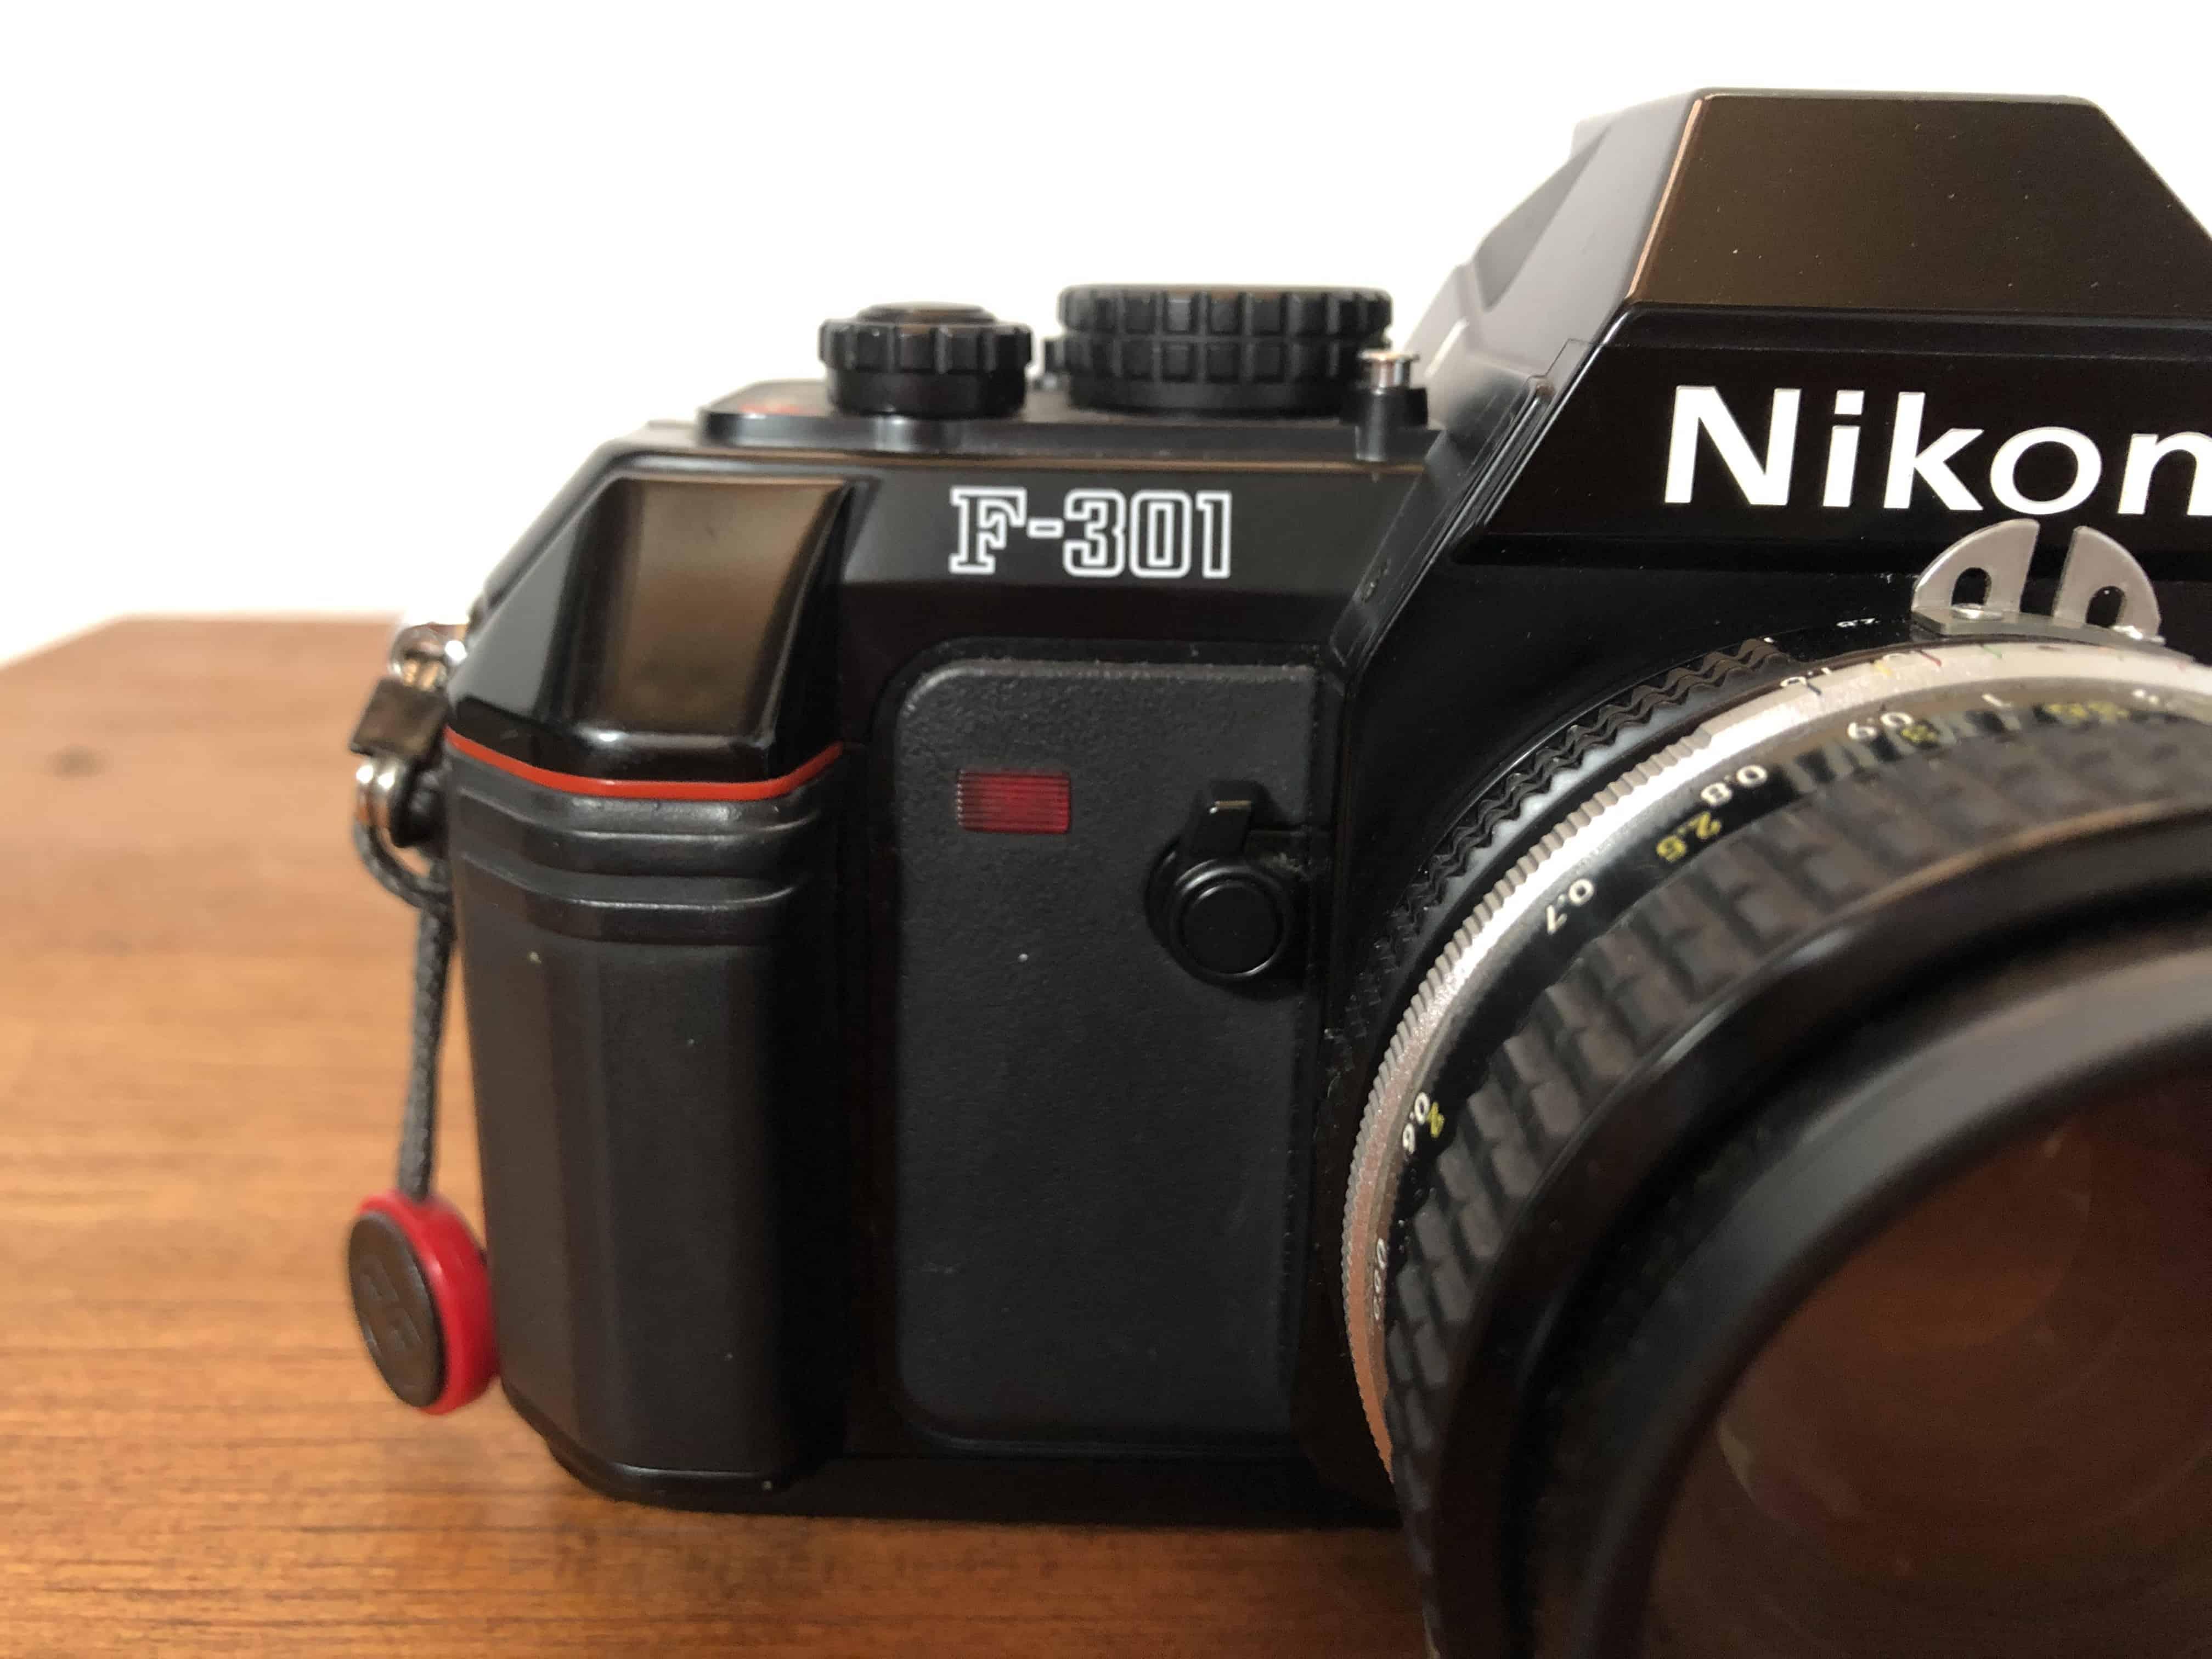 Nikon F301 Cristiano Cortonesi